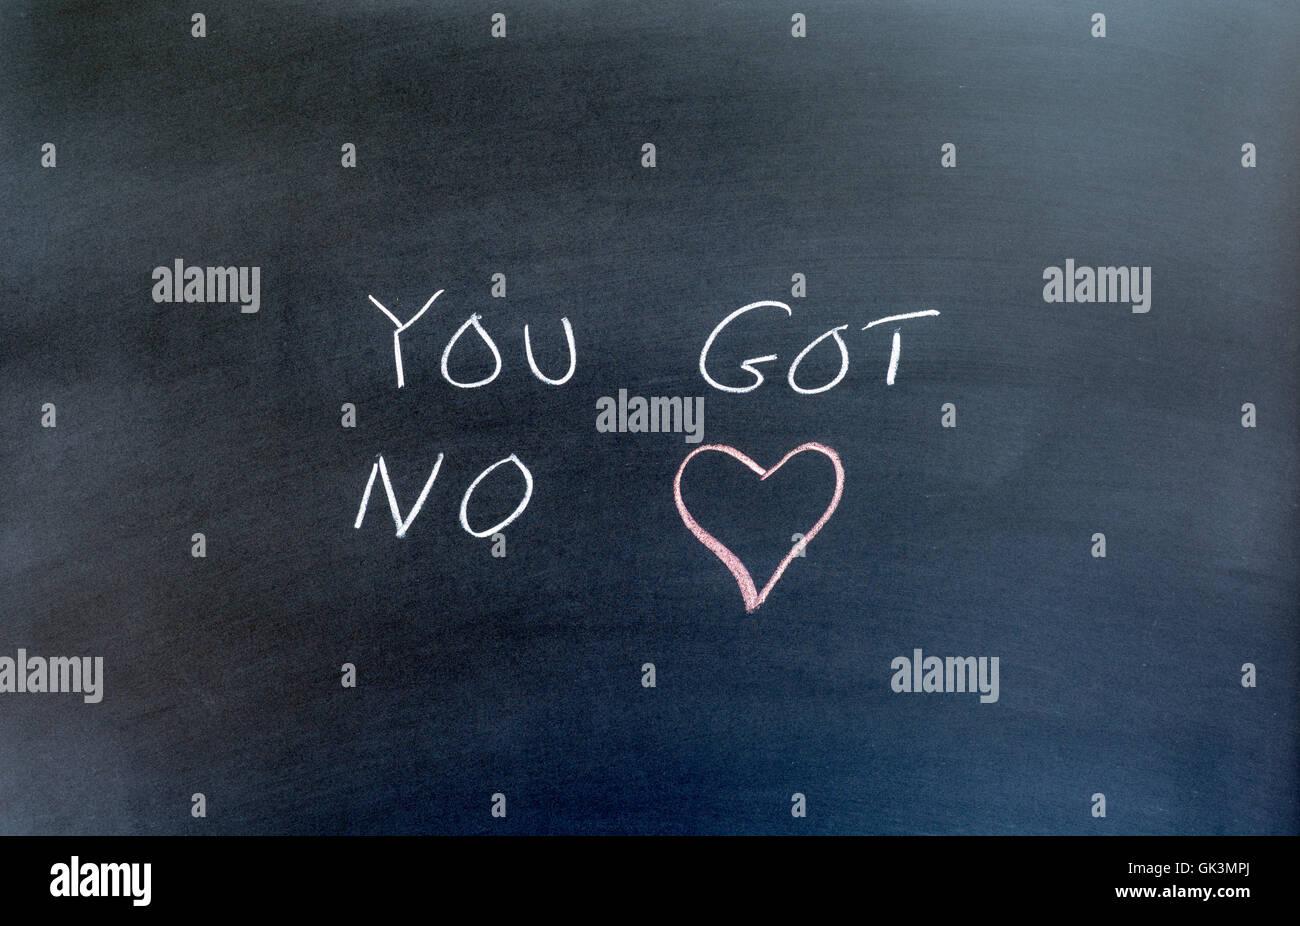 phrase 'you got no heart' written on a chalkboard. - Stock Image